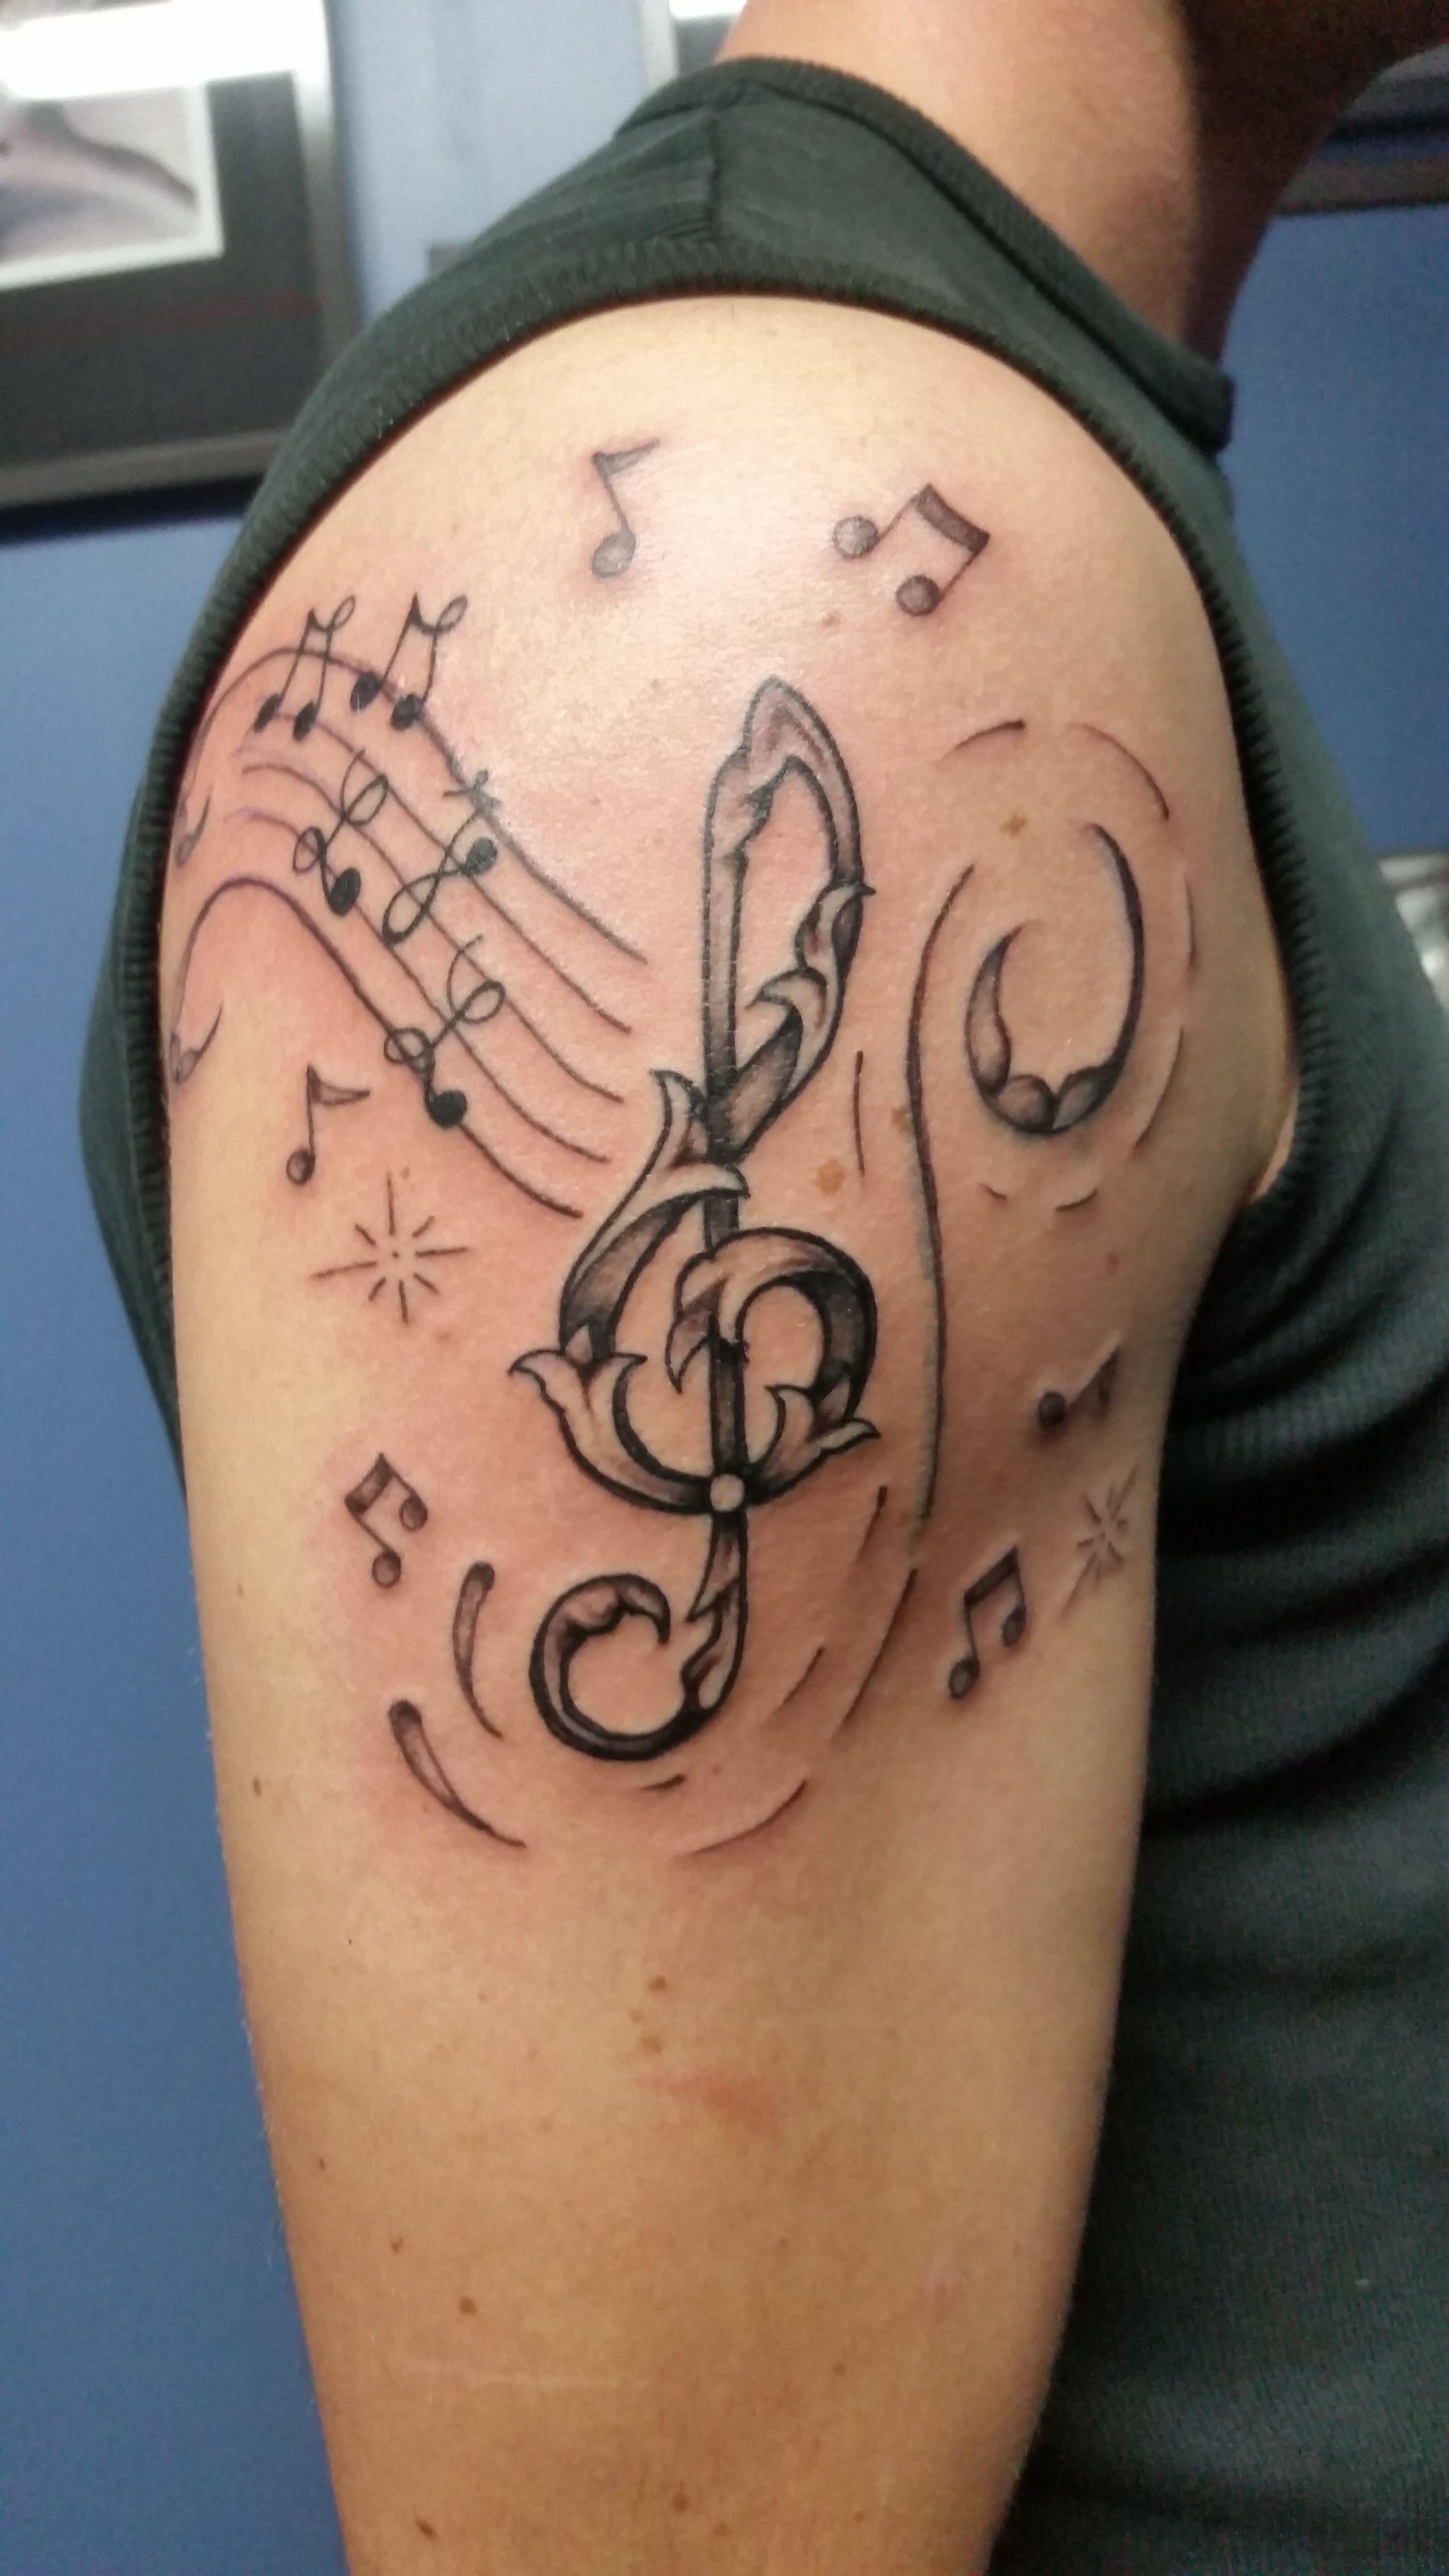 tattoo tatouage note clef de sol bras tatouages filou noir et blanc pinterest tatouage. Black Bedroom Furniture Sets. Home Design Ideas